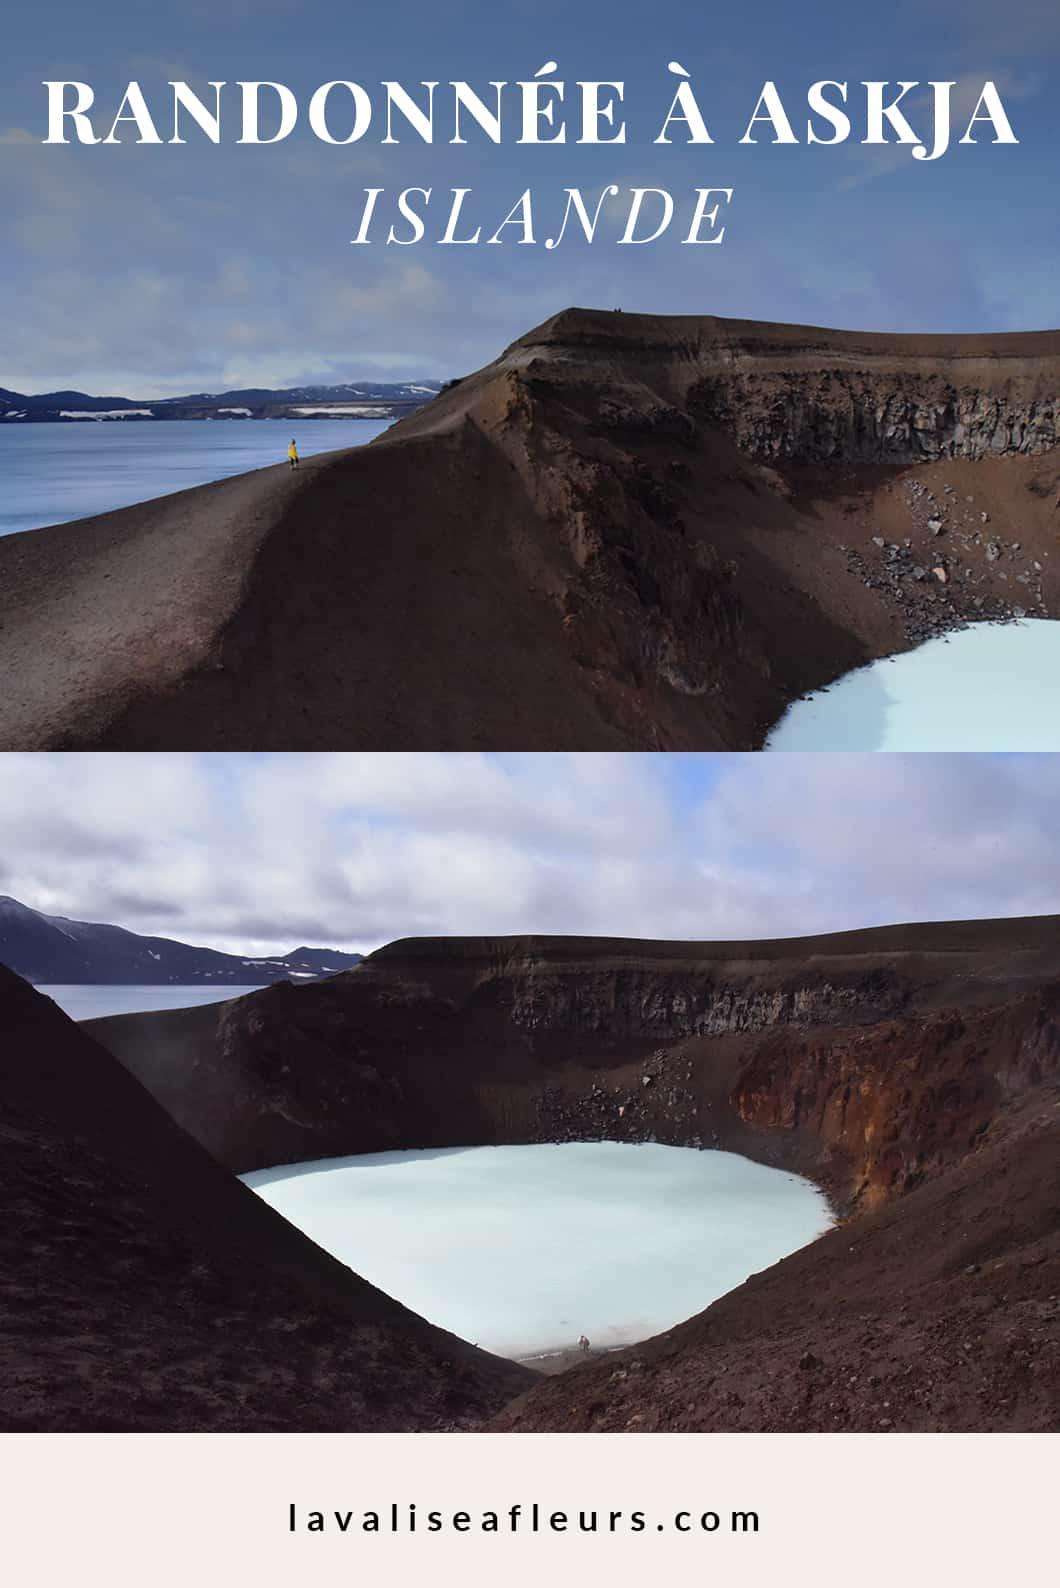 Faire la randonnée à Askja en Islande